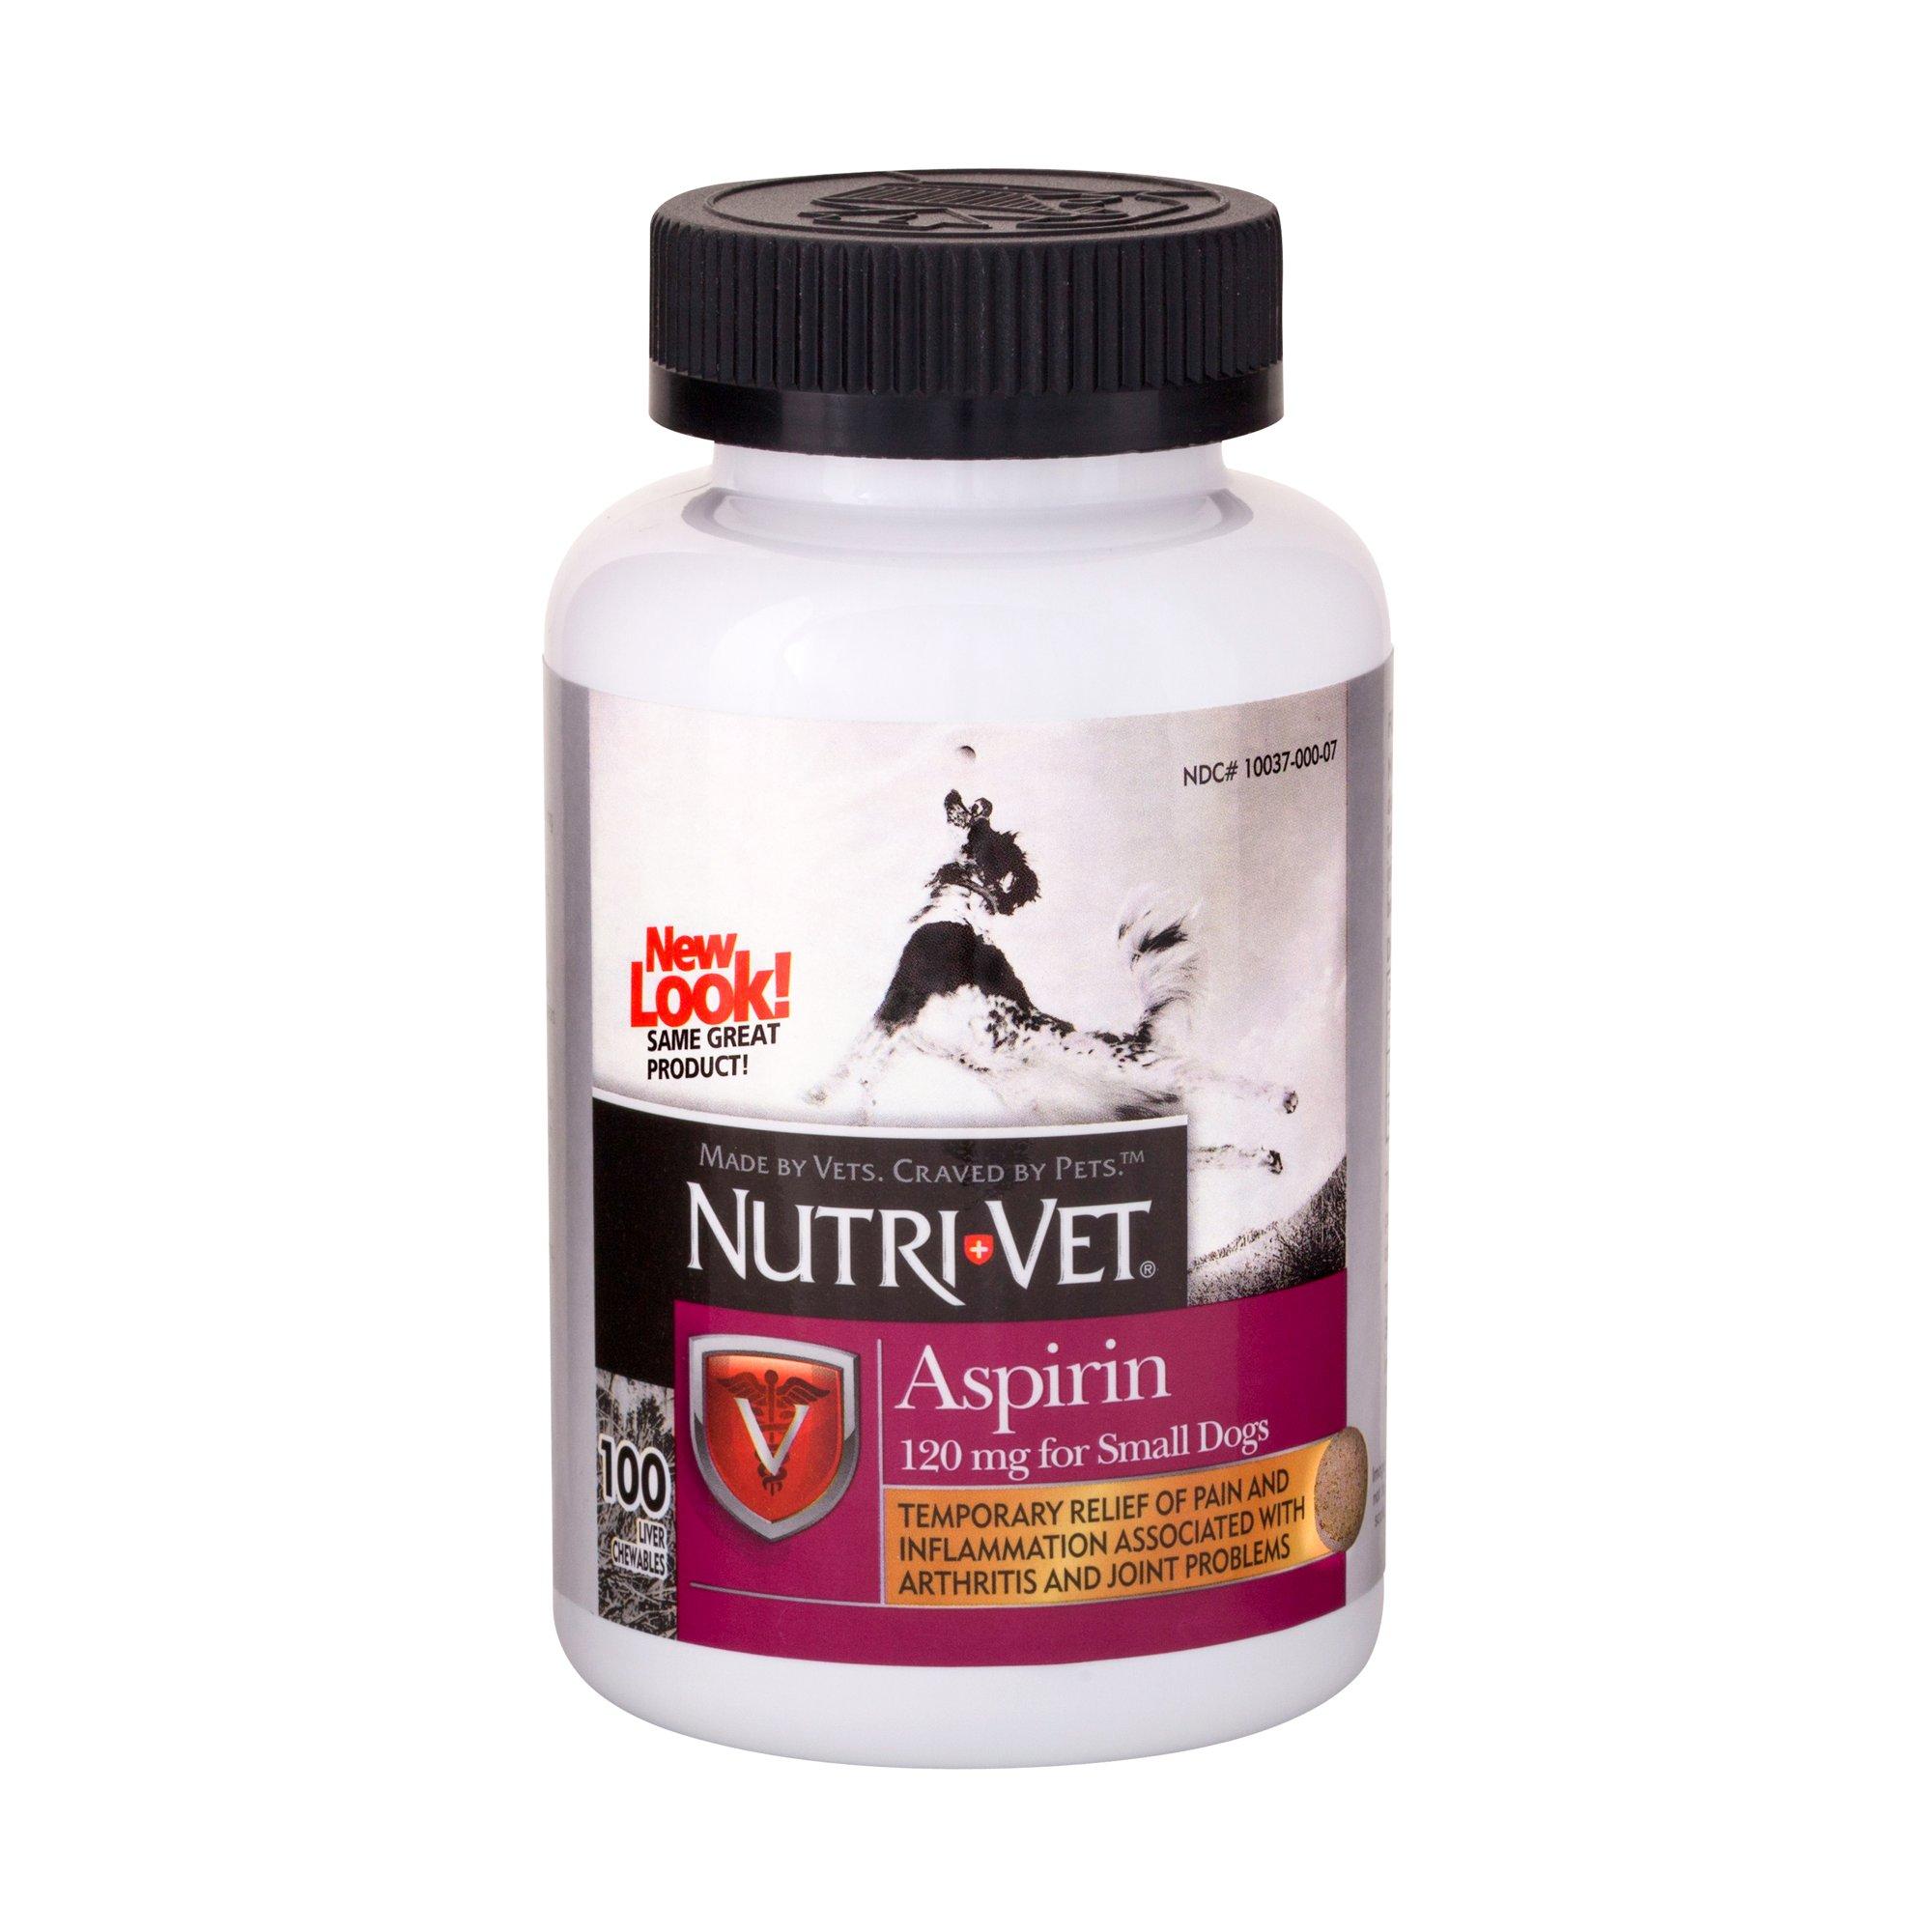 Nutri-Vet Nutritionals K-9 Aspirin for Small Dogs